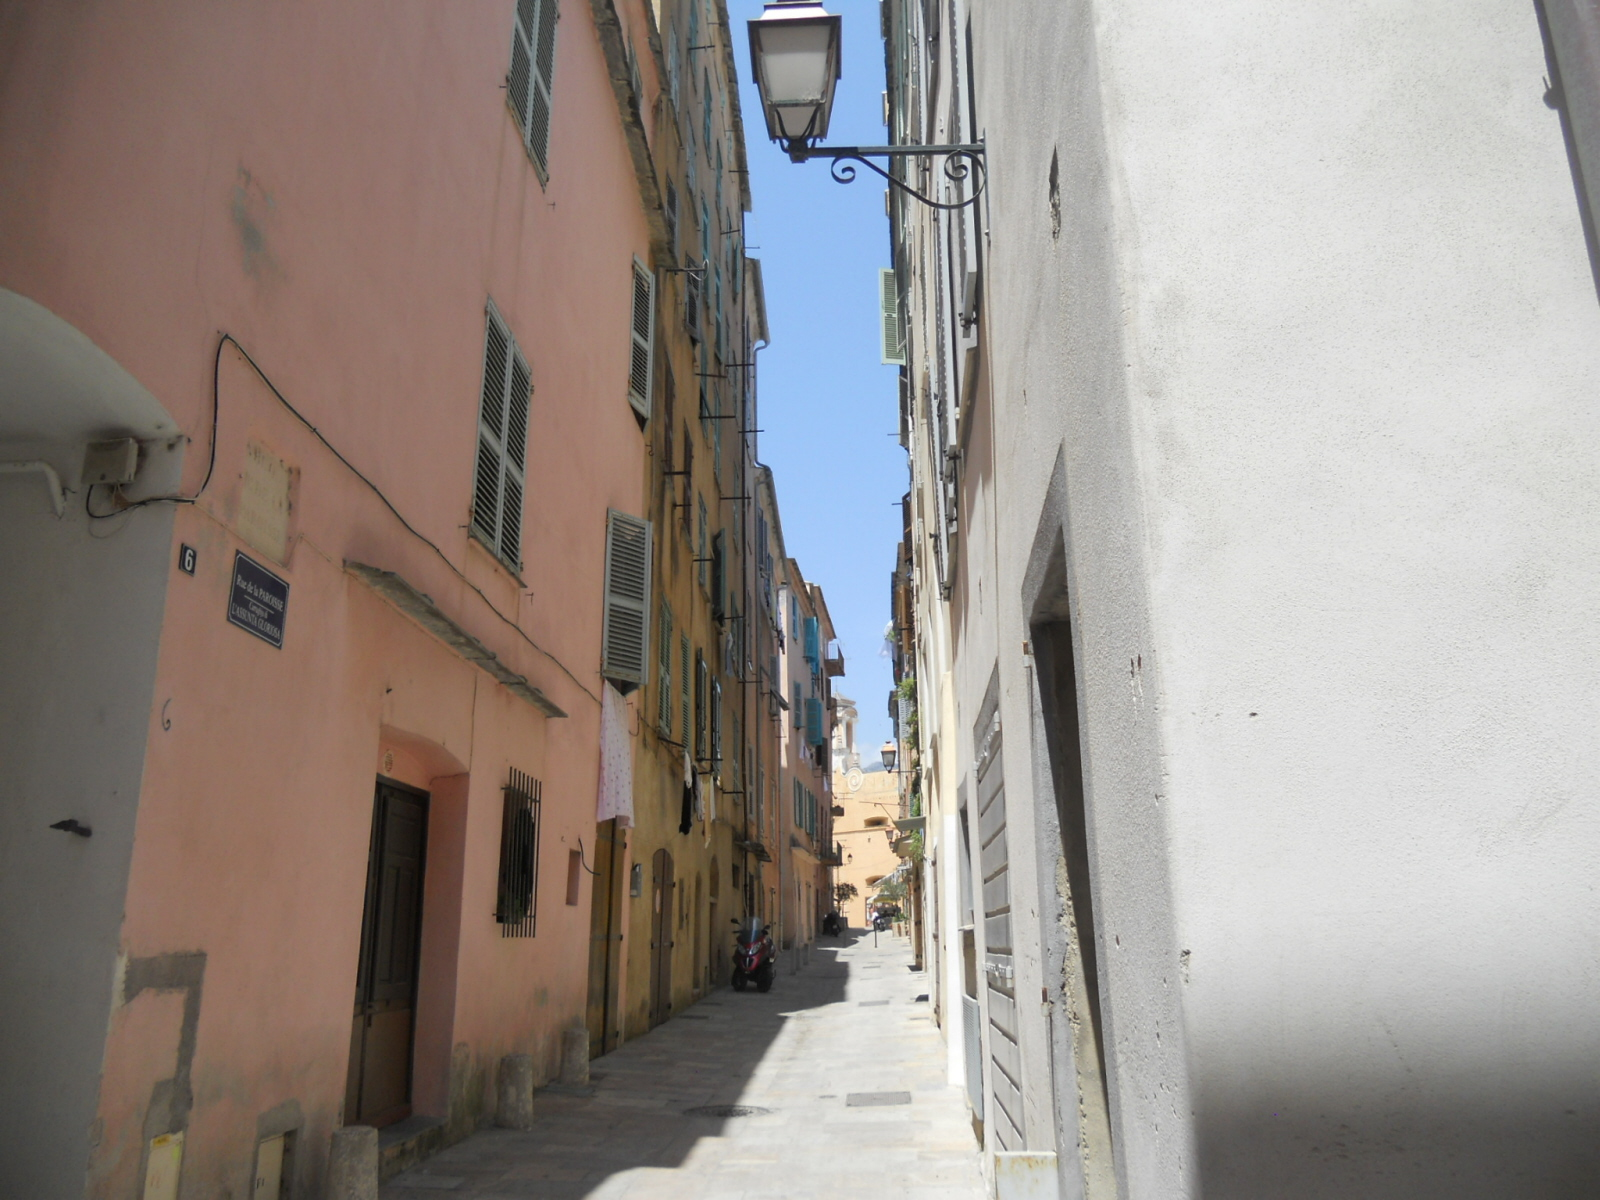 Bastia. Dawna stolica Korsyki